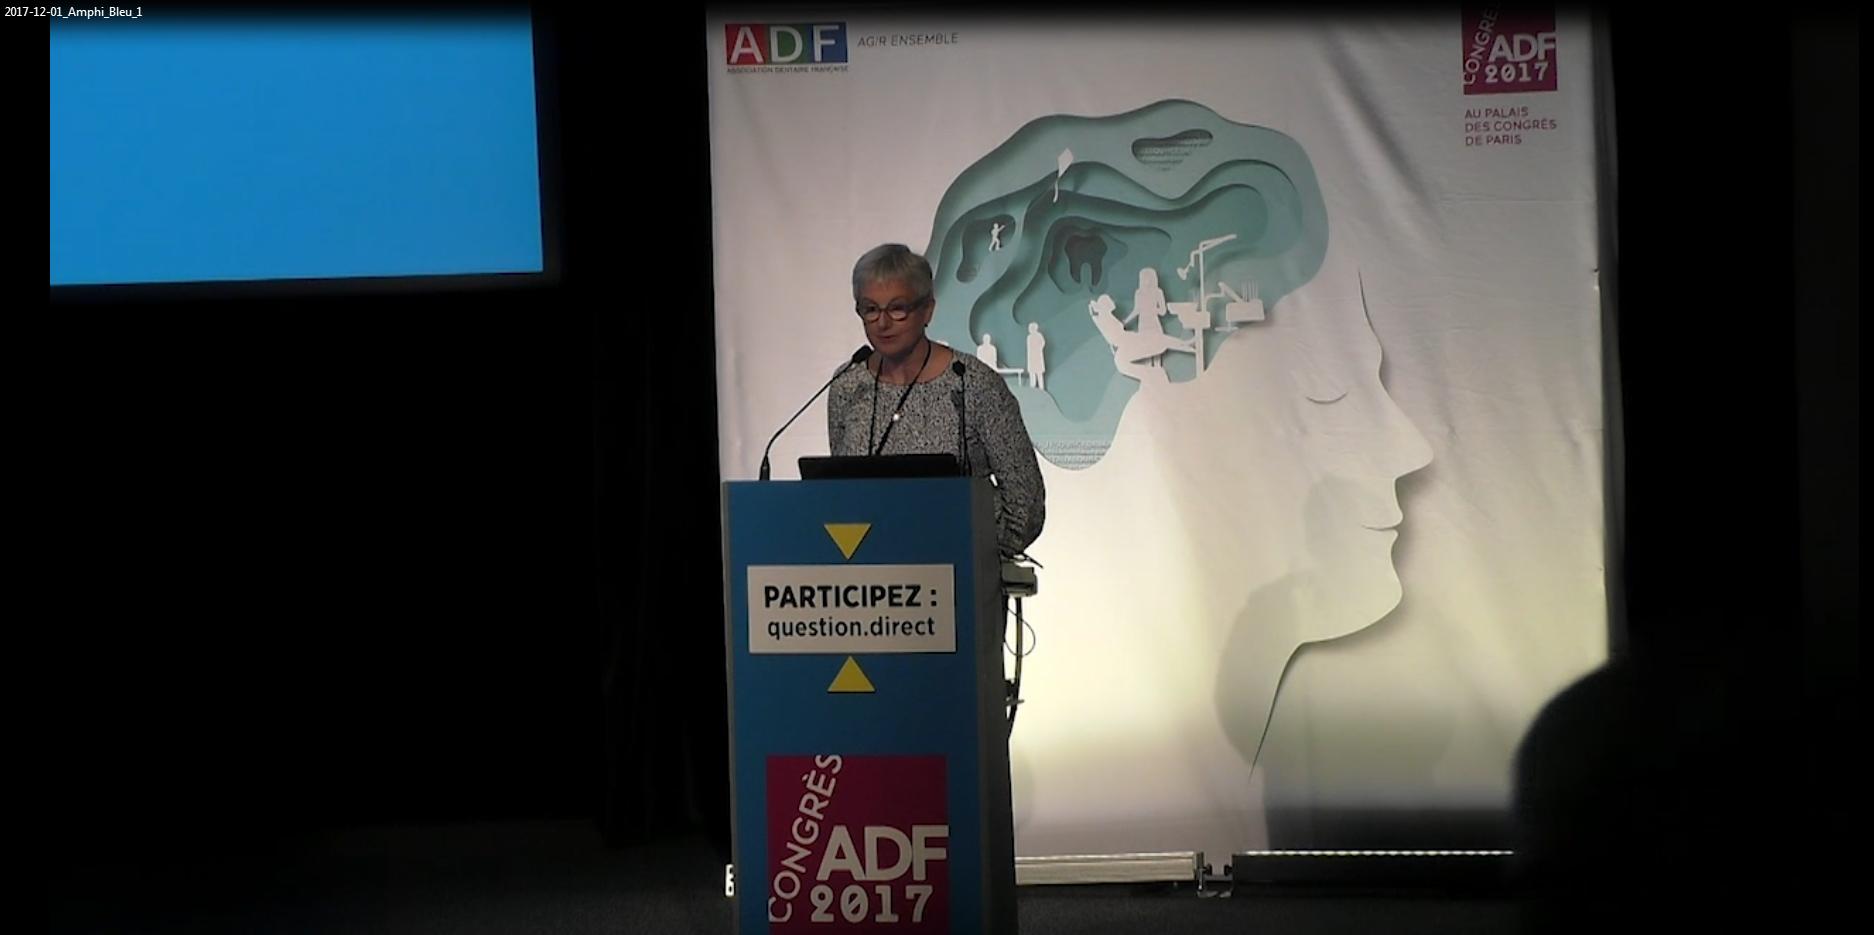 Conférence ADF 2017 «AROMATHERAPIE EN PARODONTIE  :  MYTHE OU REALITE?»